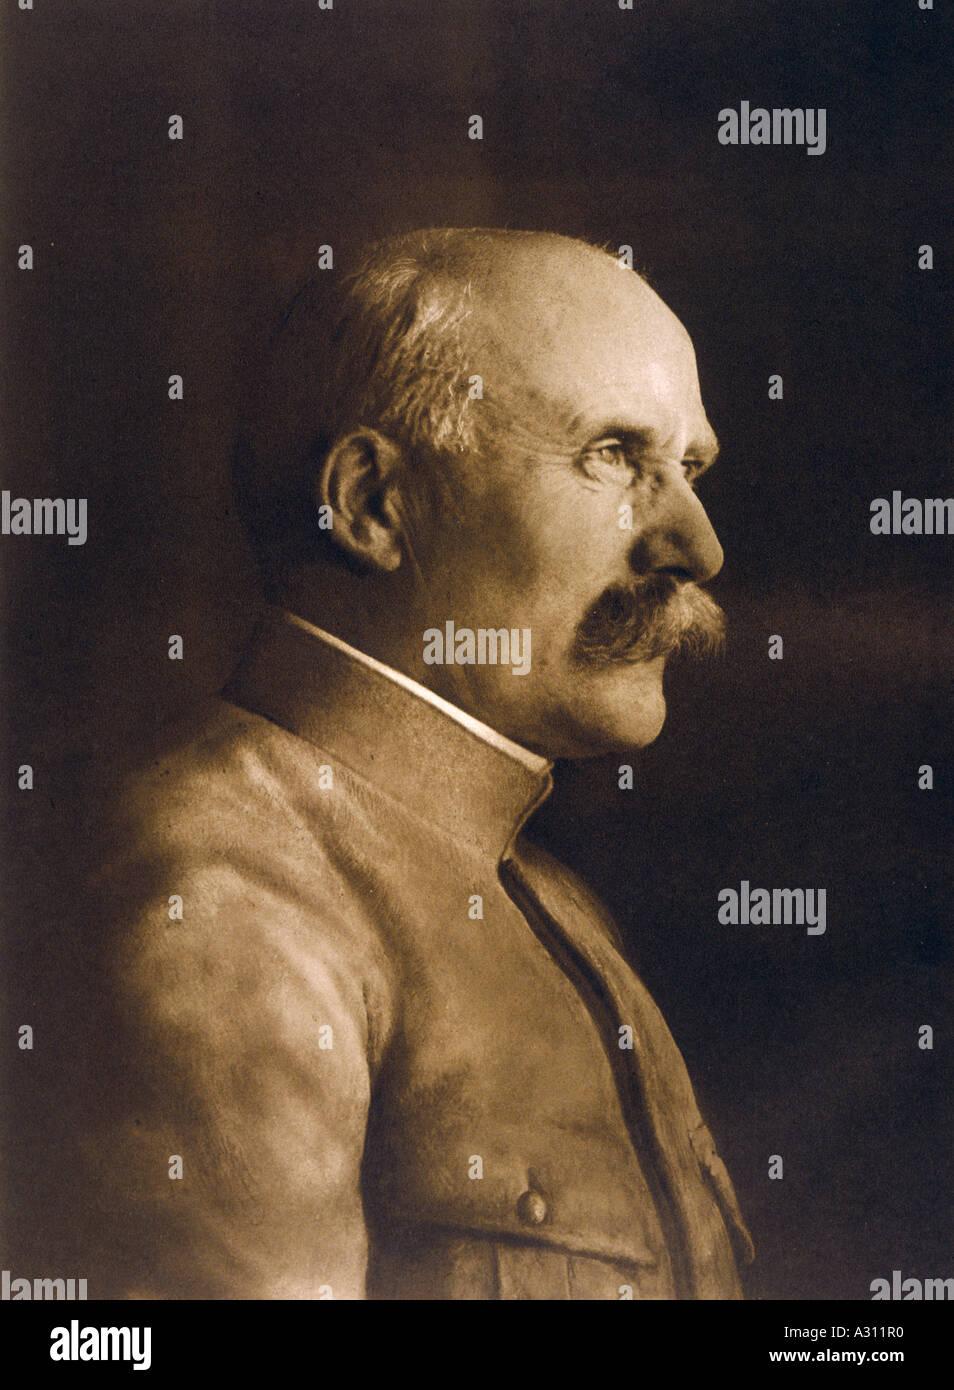 Marshal Petain Ils 1917 - Stock Image